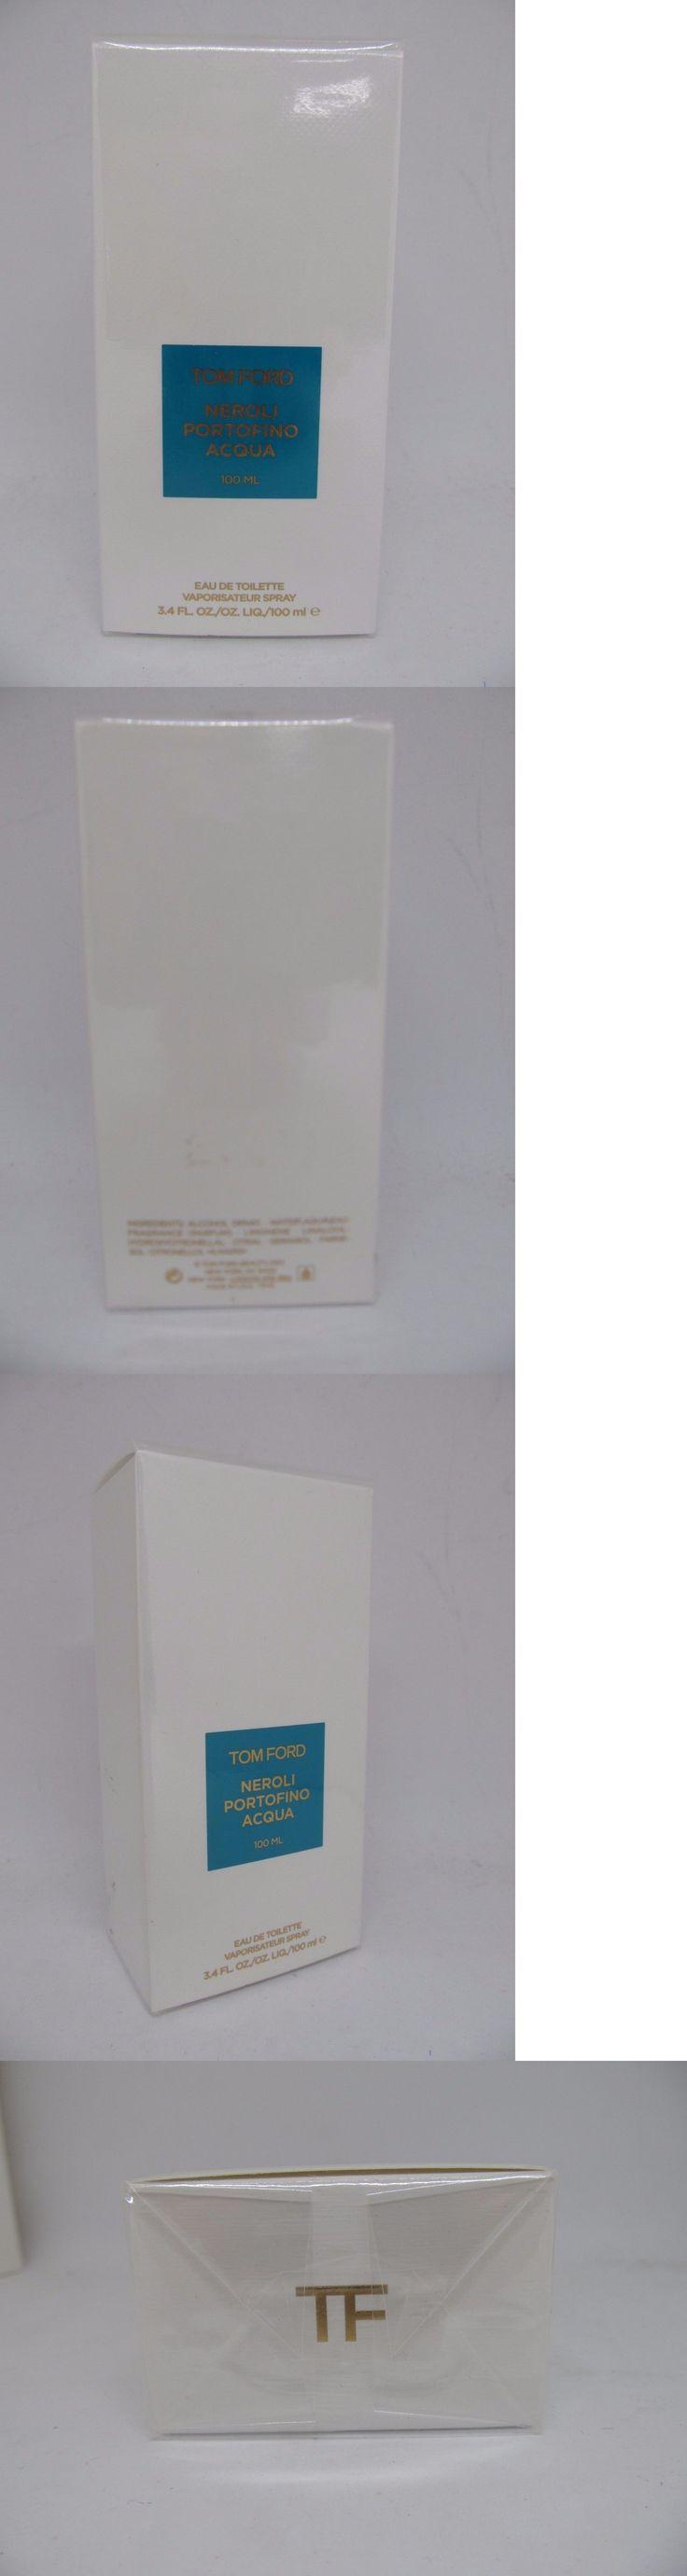 Unisex Fragrances: Tom Ford Neroli Portofino Acqua Eau De Toilette Spray 3.4 Fl.Oz. 100 Ml Nib -> BUY IT NOW ONLY: $133.85 on eBay!